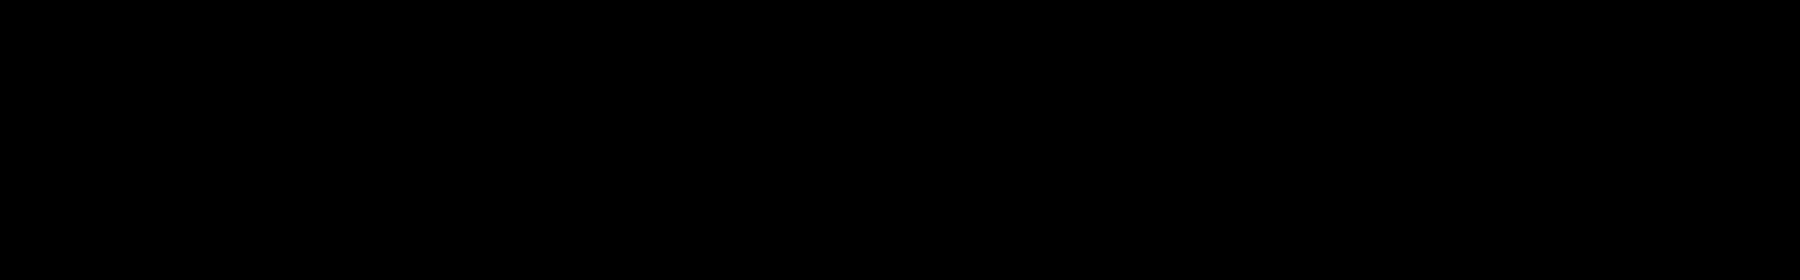 Tunecraft PsyTrance Toolkit audio waveform